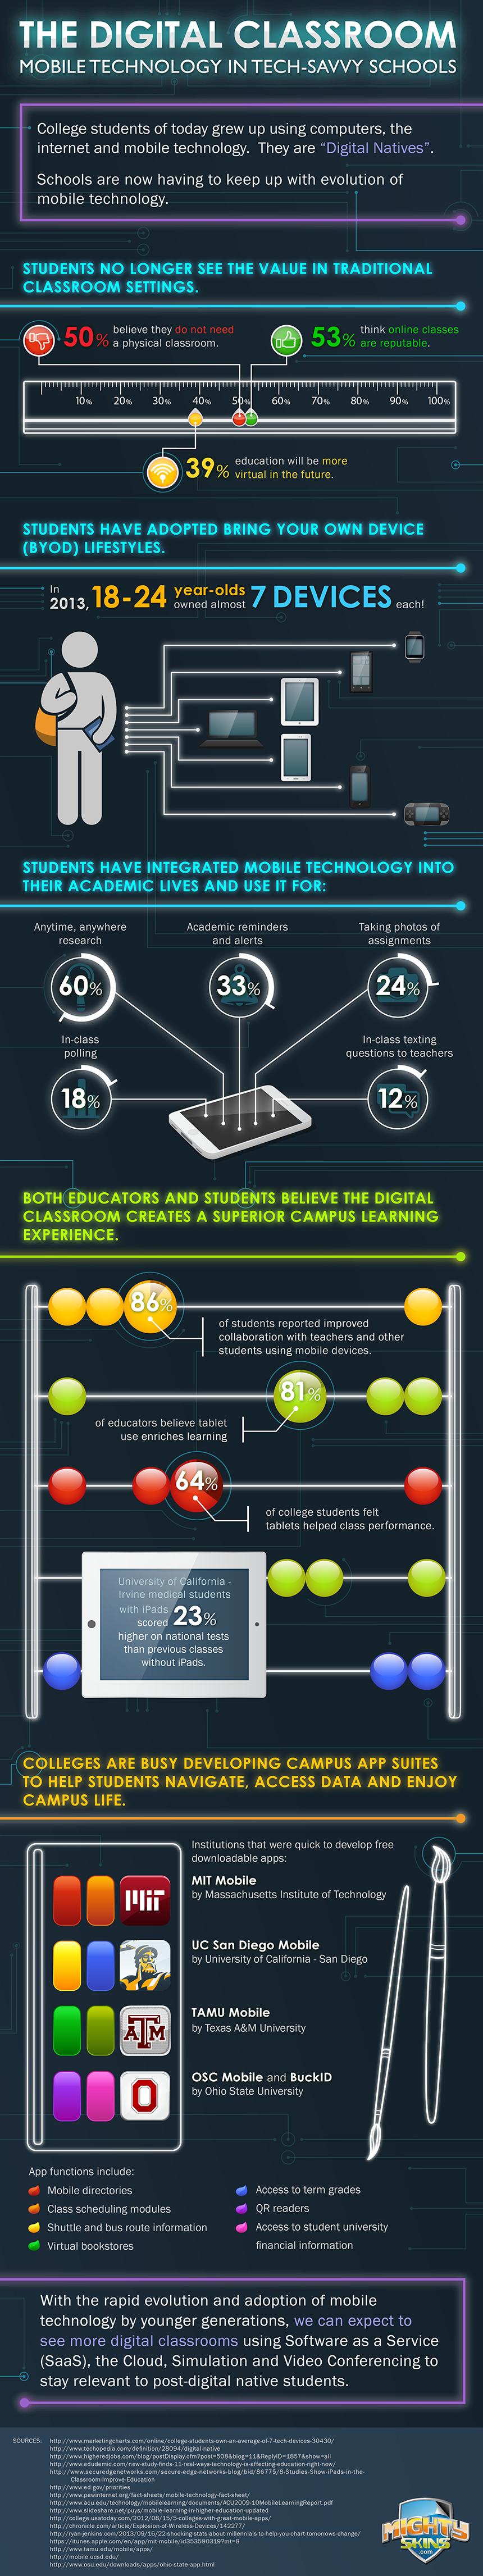 The-Digital-Classroom